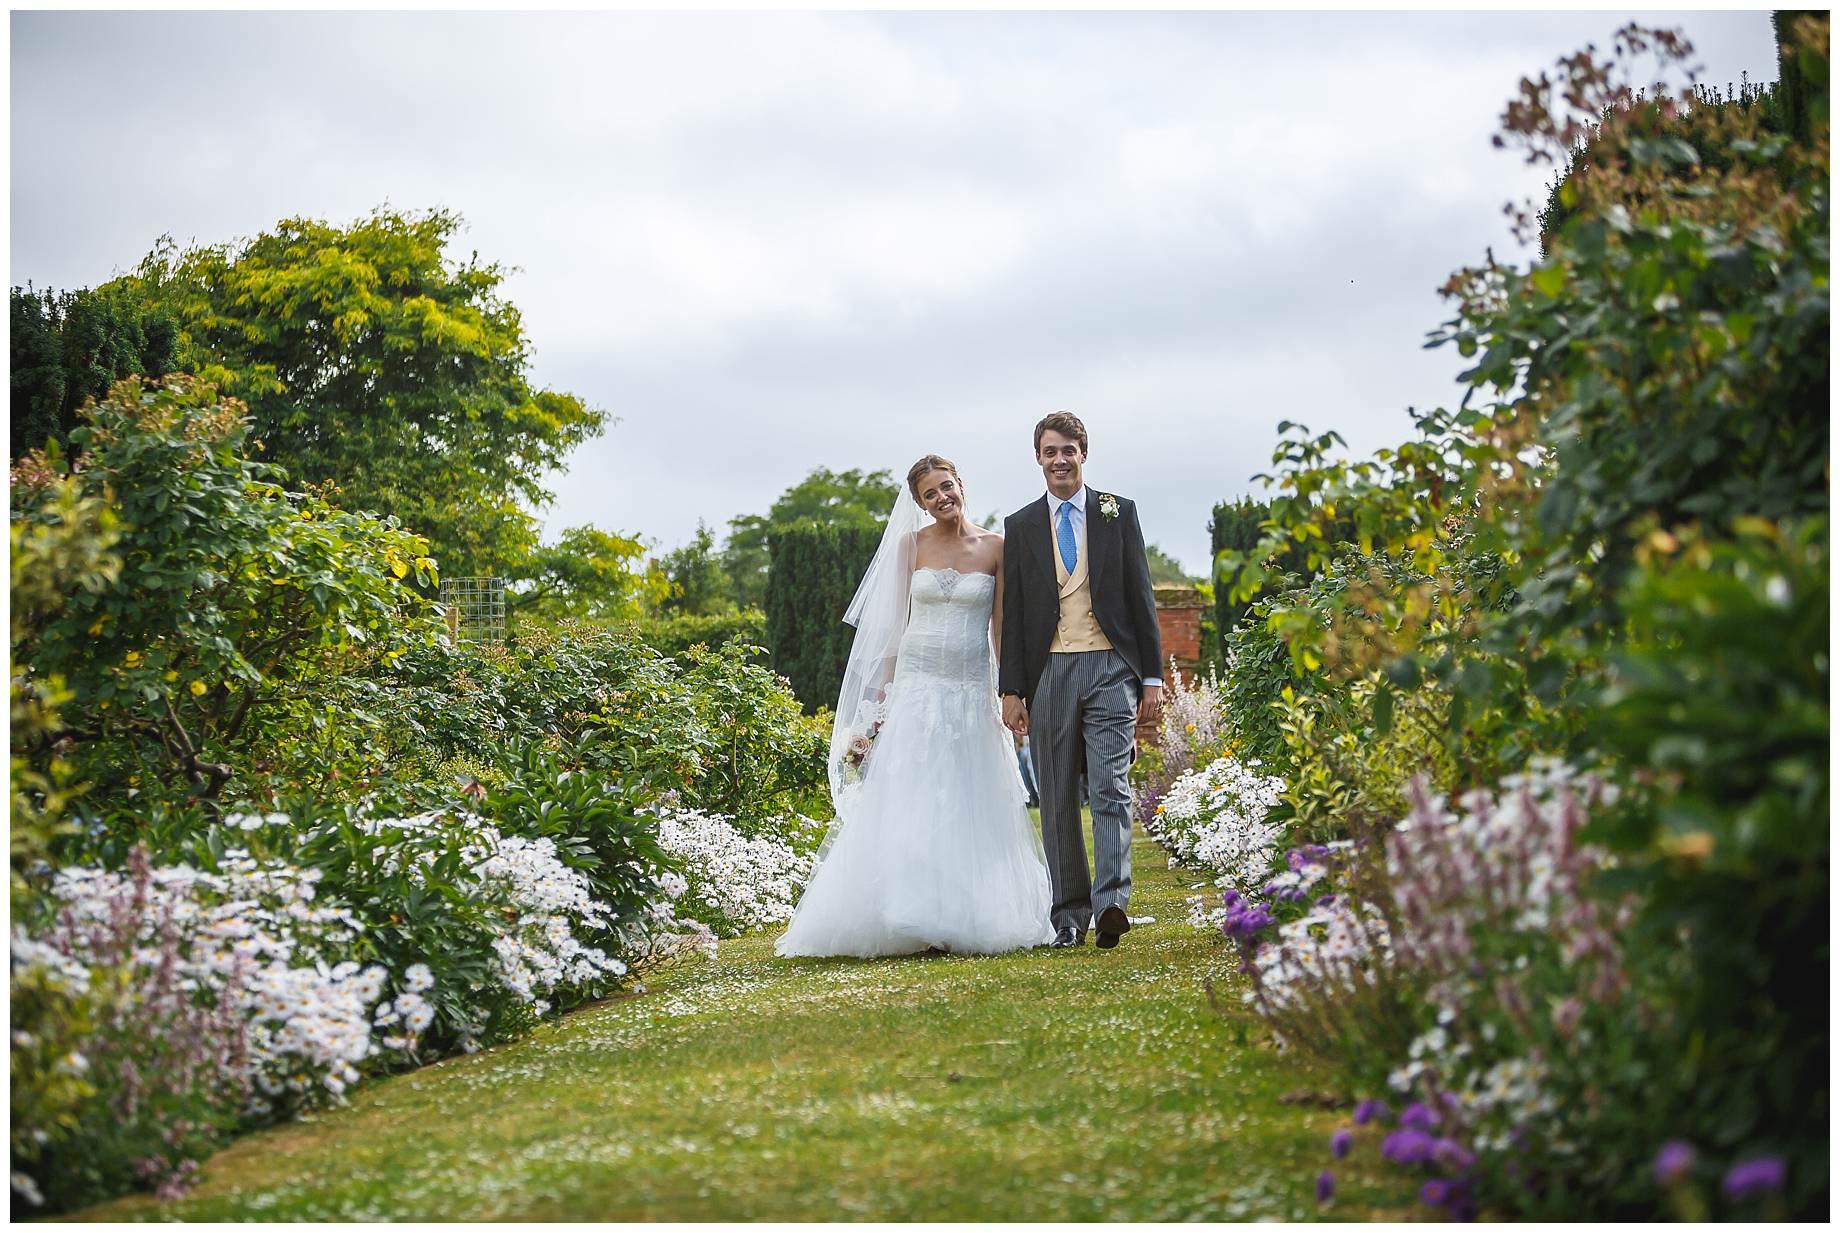 Goodnestone Park Wedding bride and groom walking